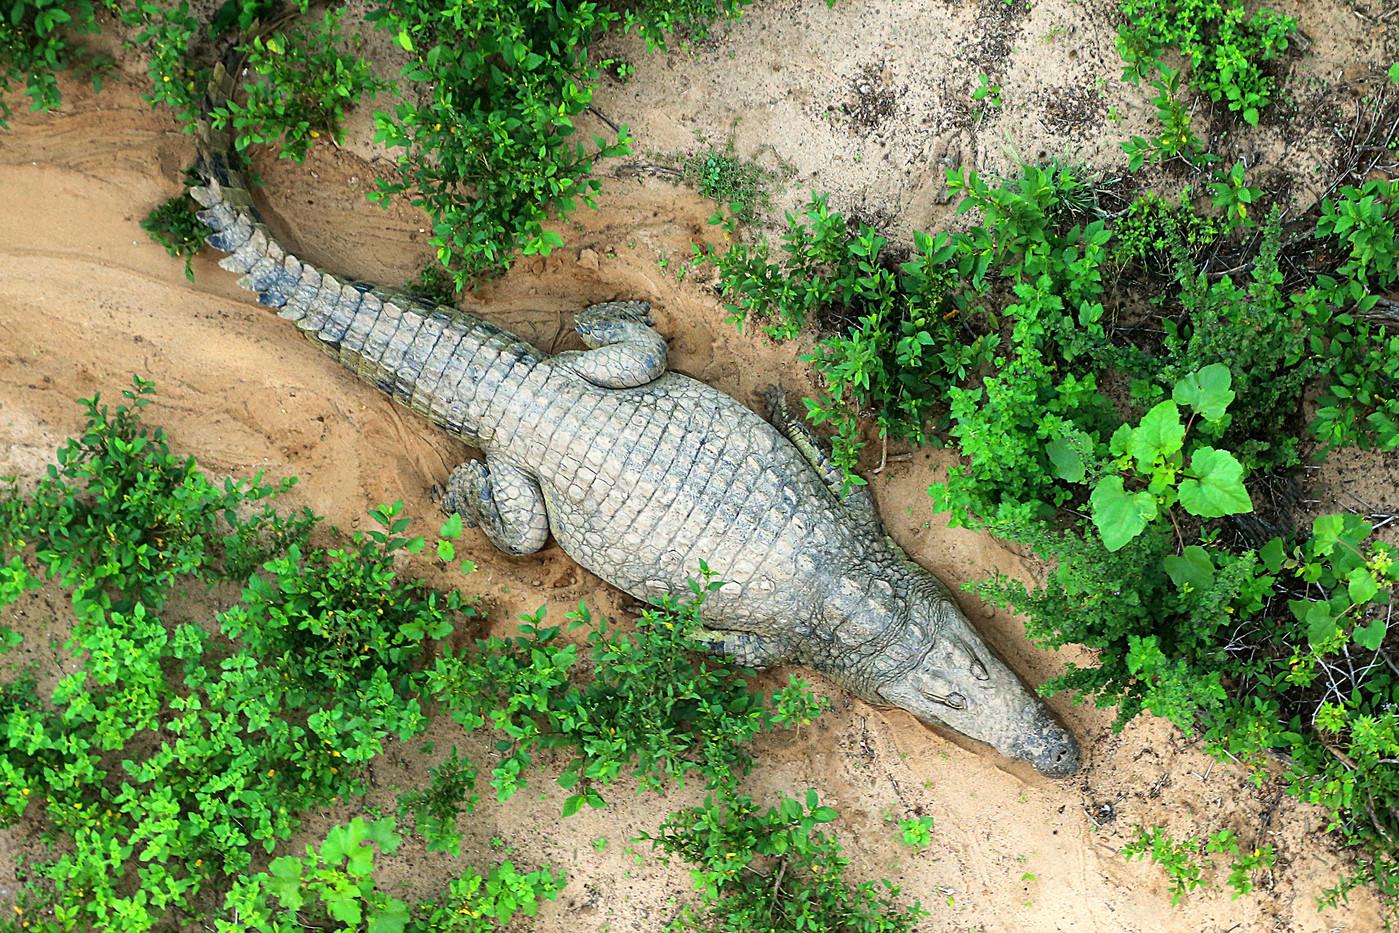 Nile Crocodile on the banks of the Mara River, Tanzania